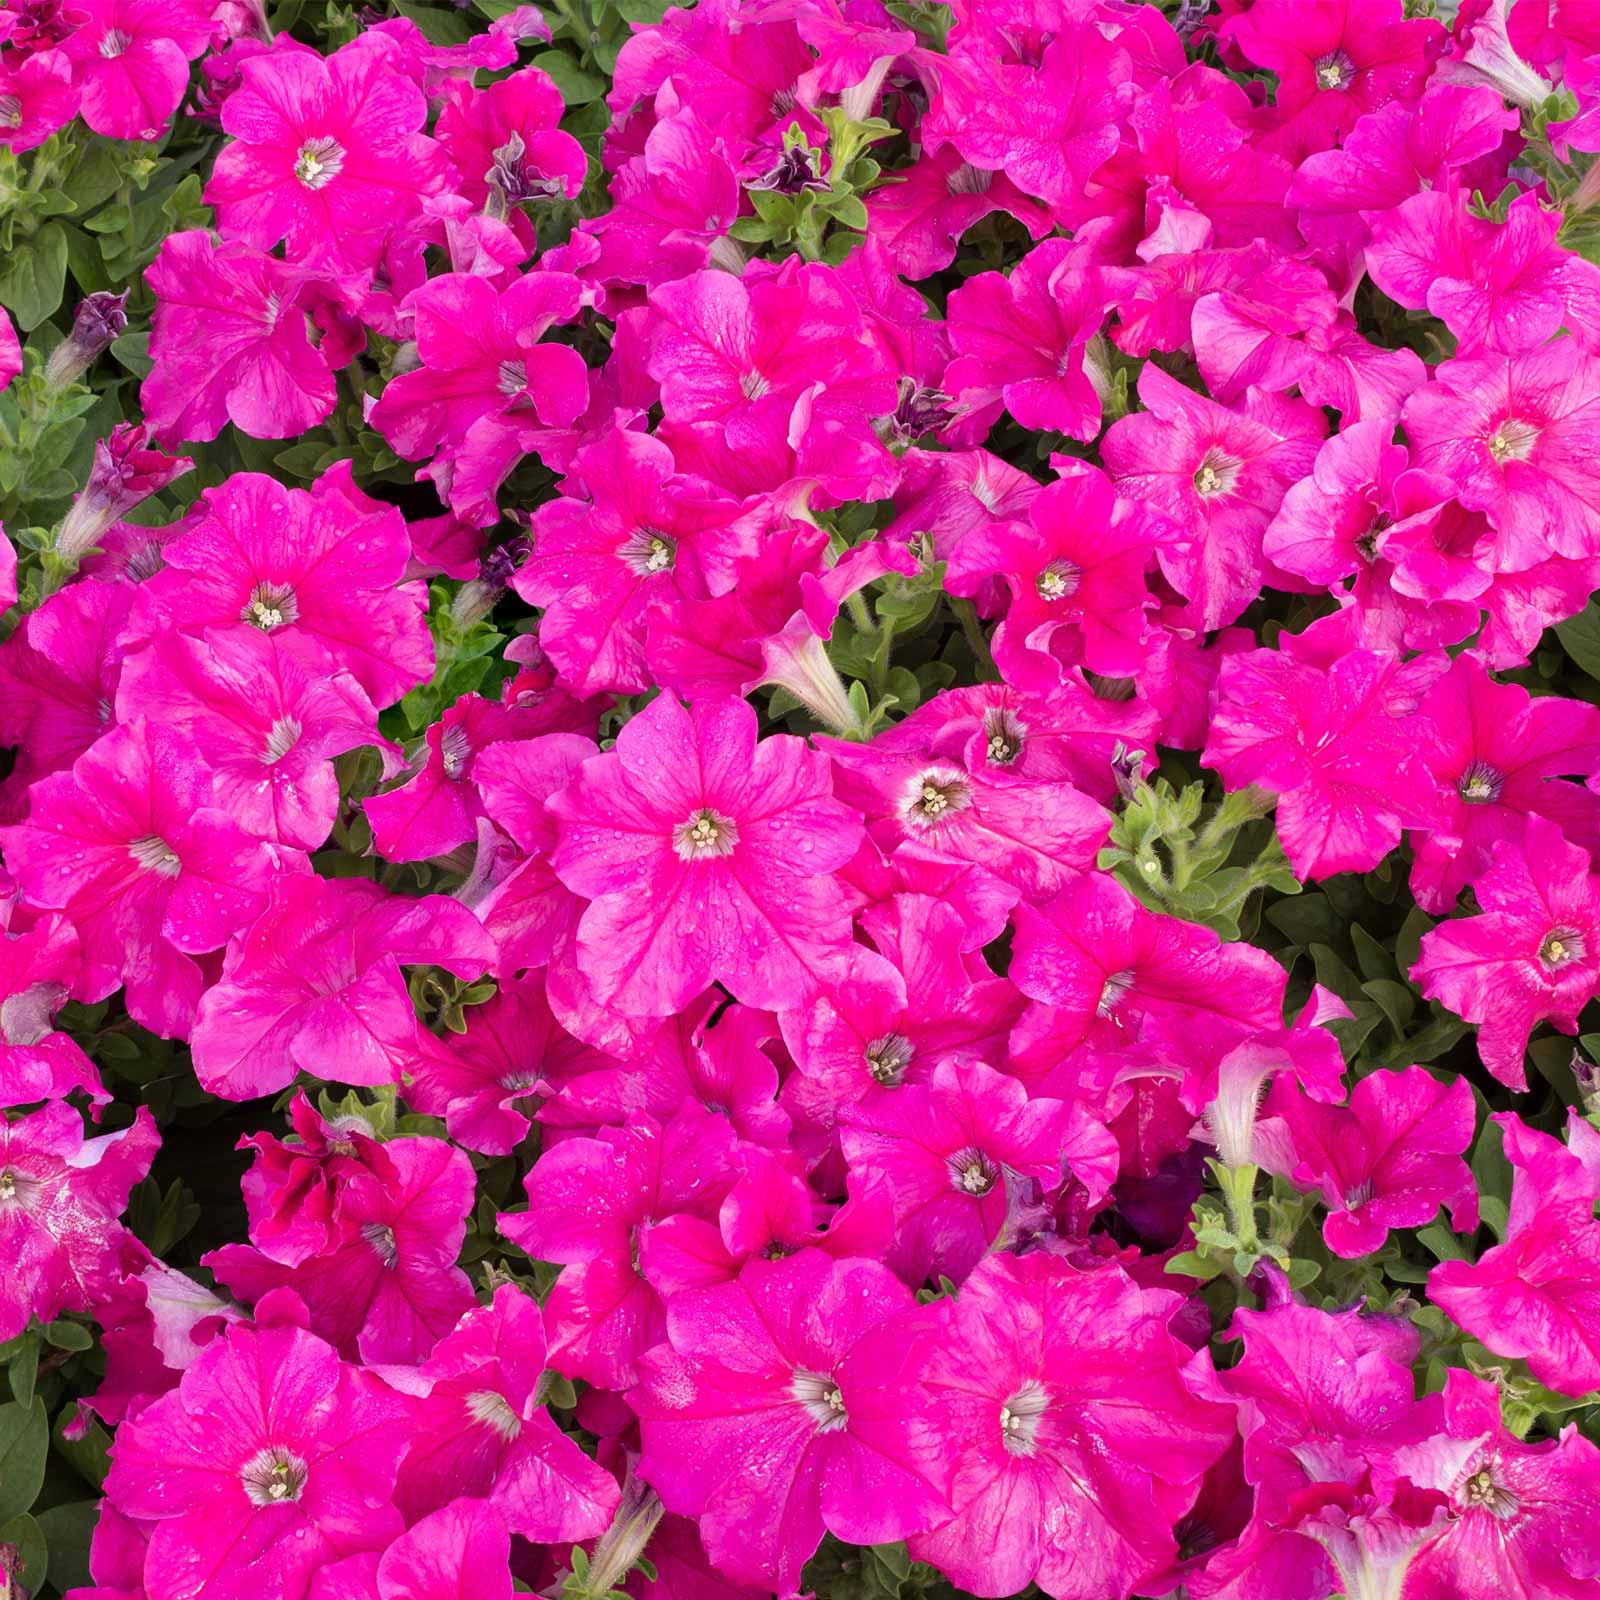 Mountain Valley Seed Company Seeds: Petunia -Picobella Series Flower Garden-Pelleted -Carmine Color